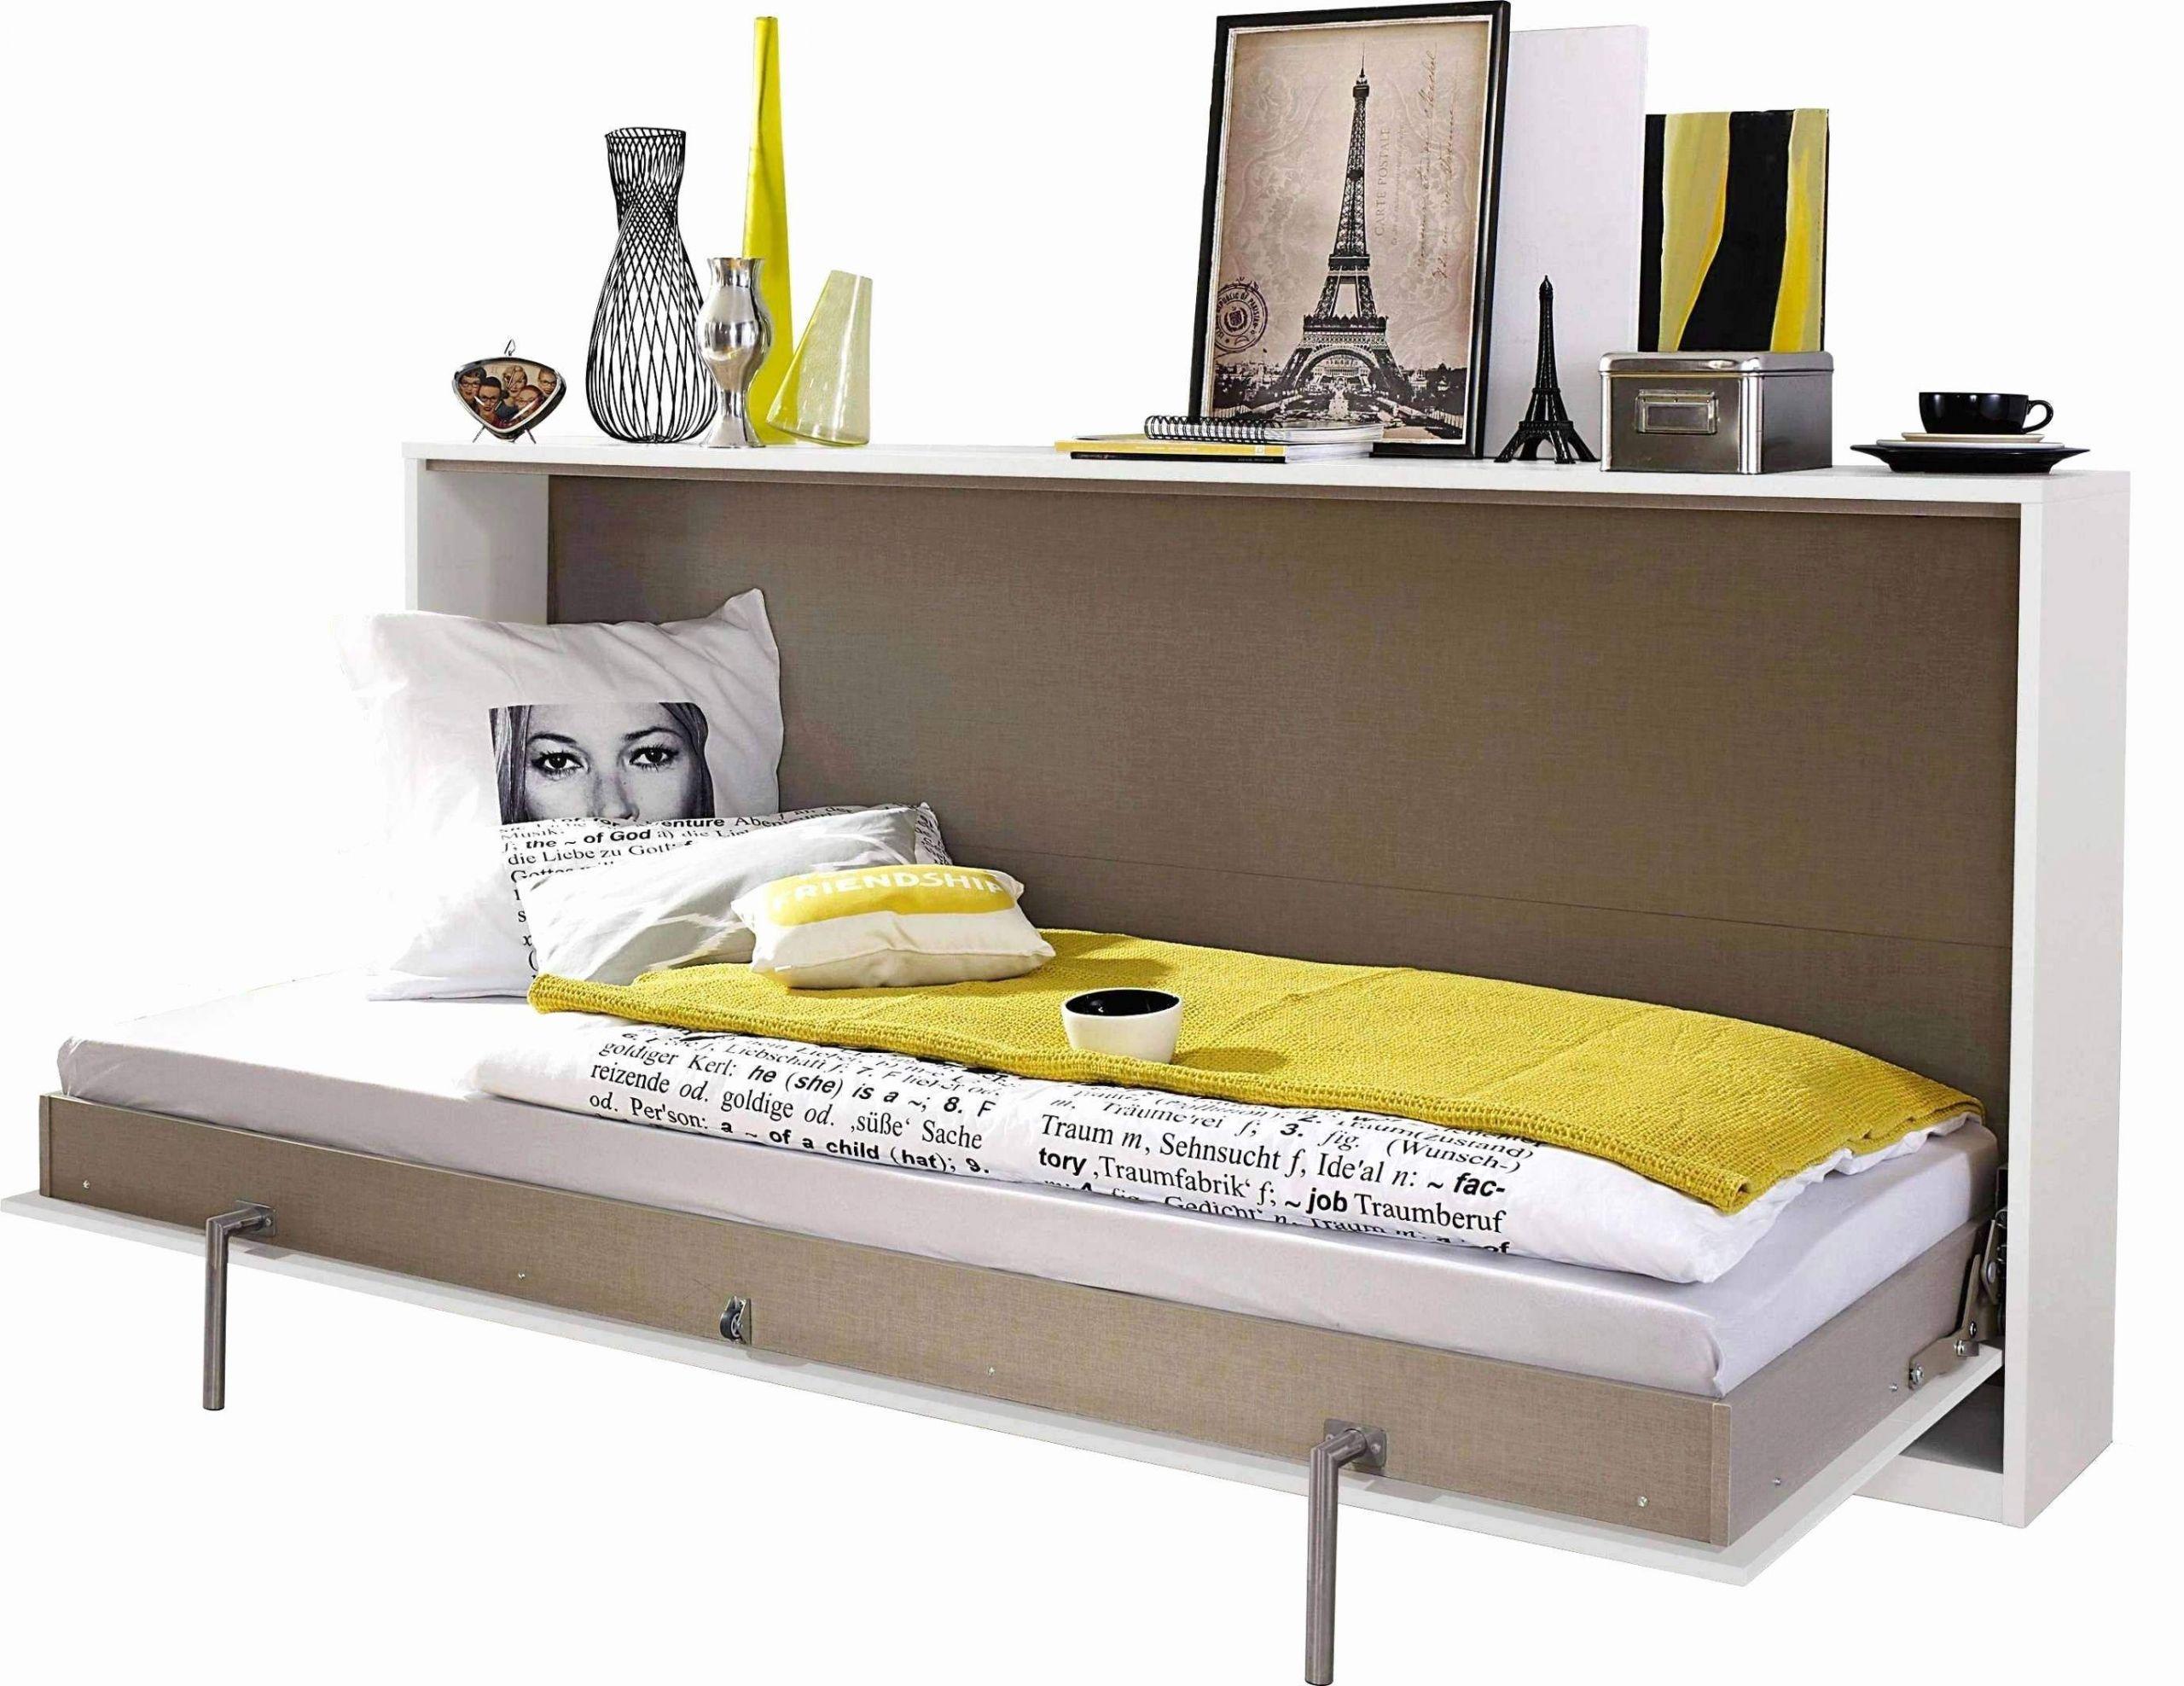 ideen furs wohnzimmer genial schone deko furs wohnzimmer luxus of ideen furs wohnzimmer